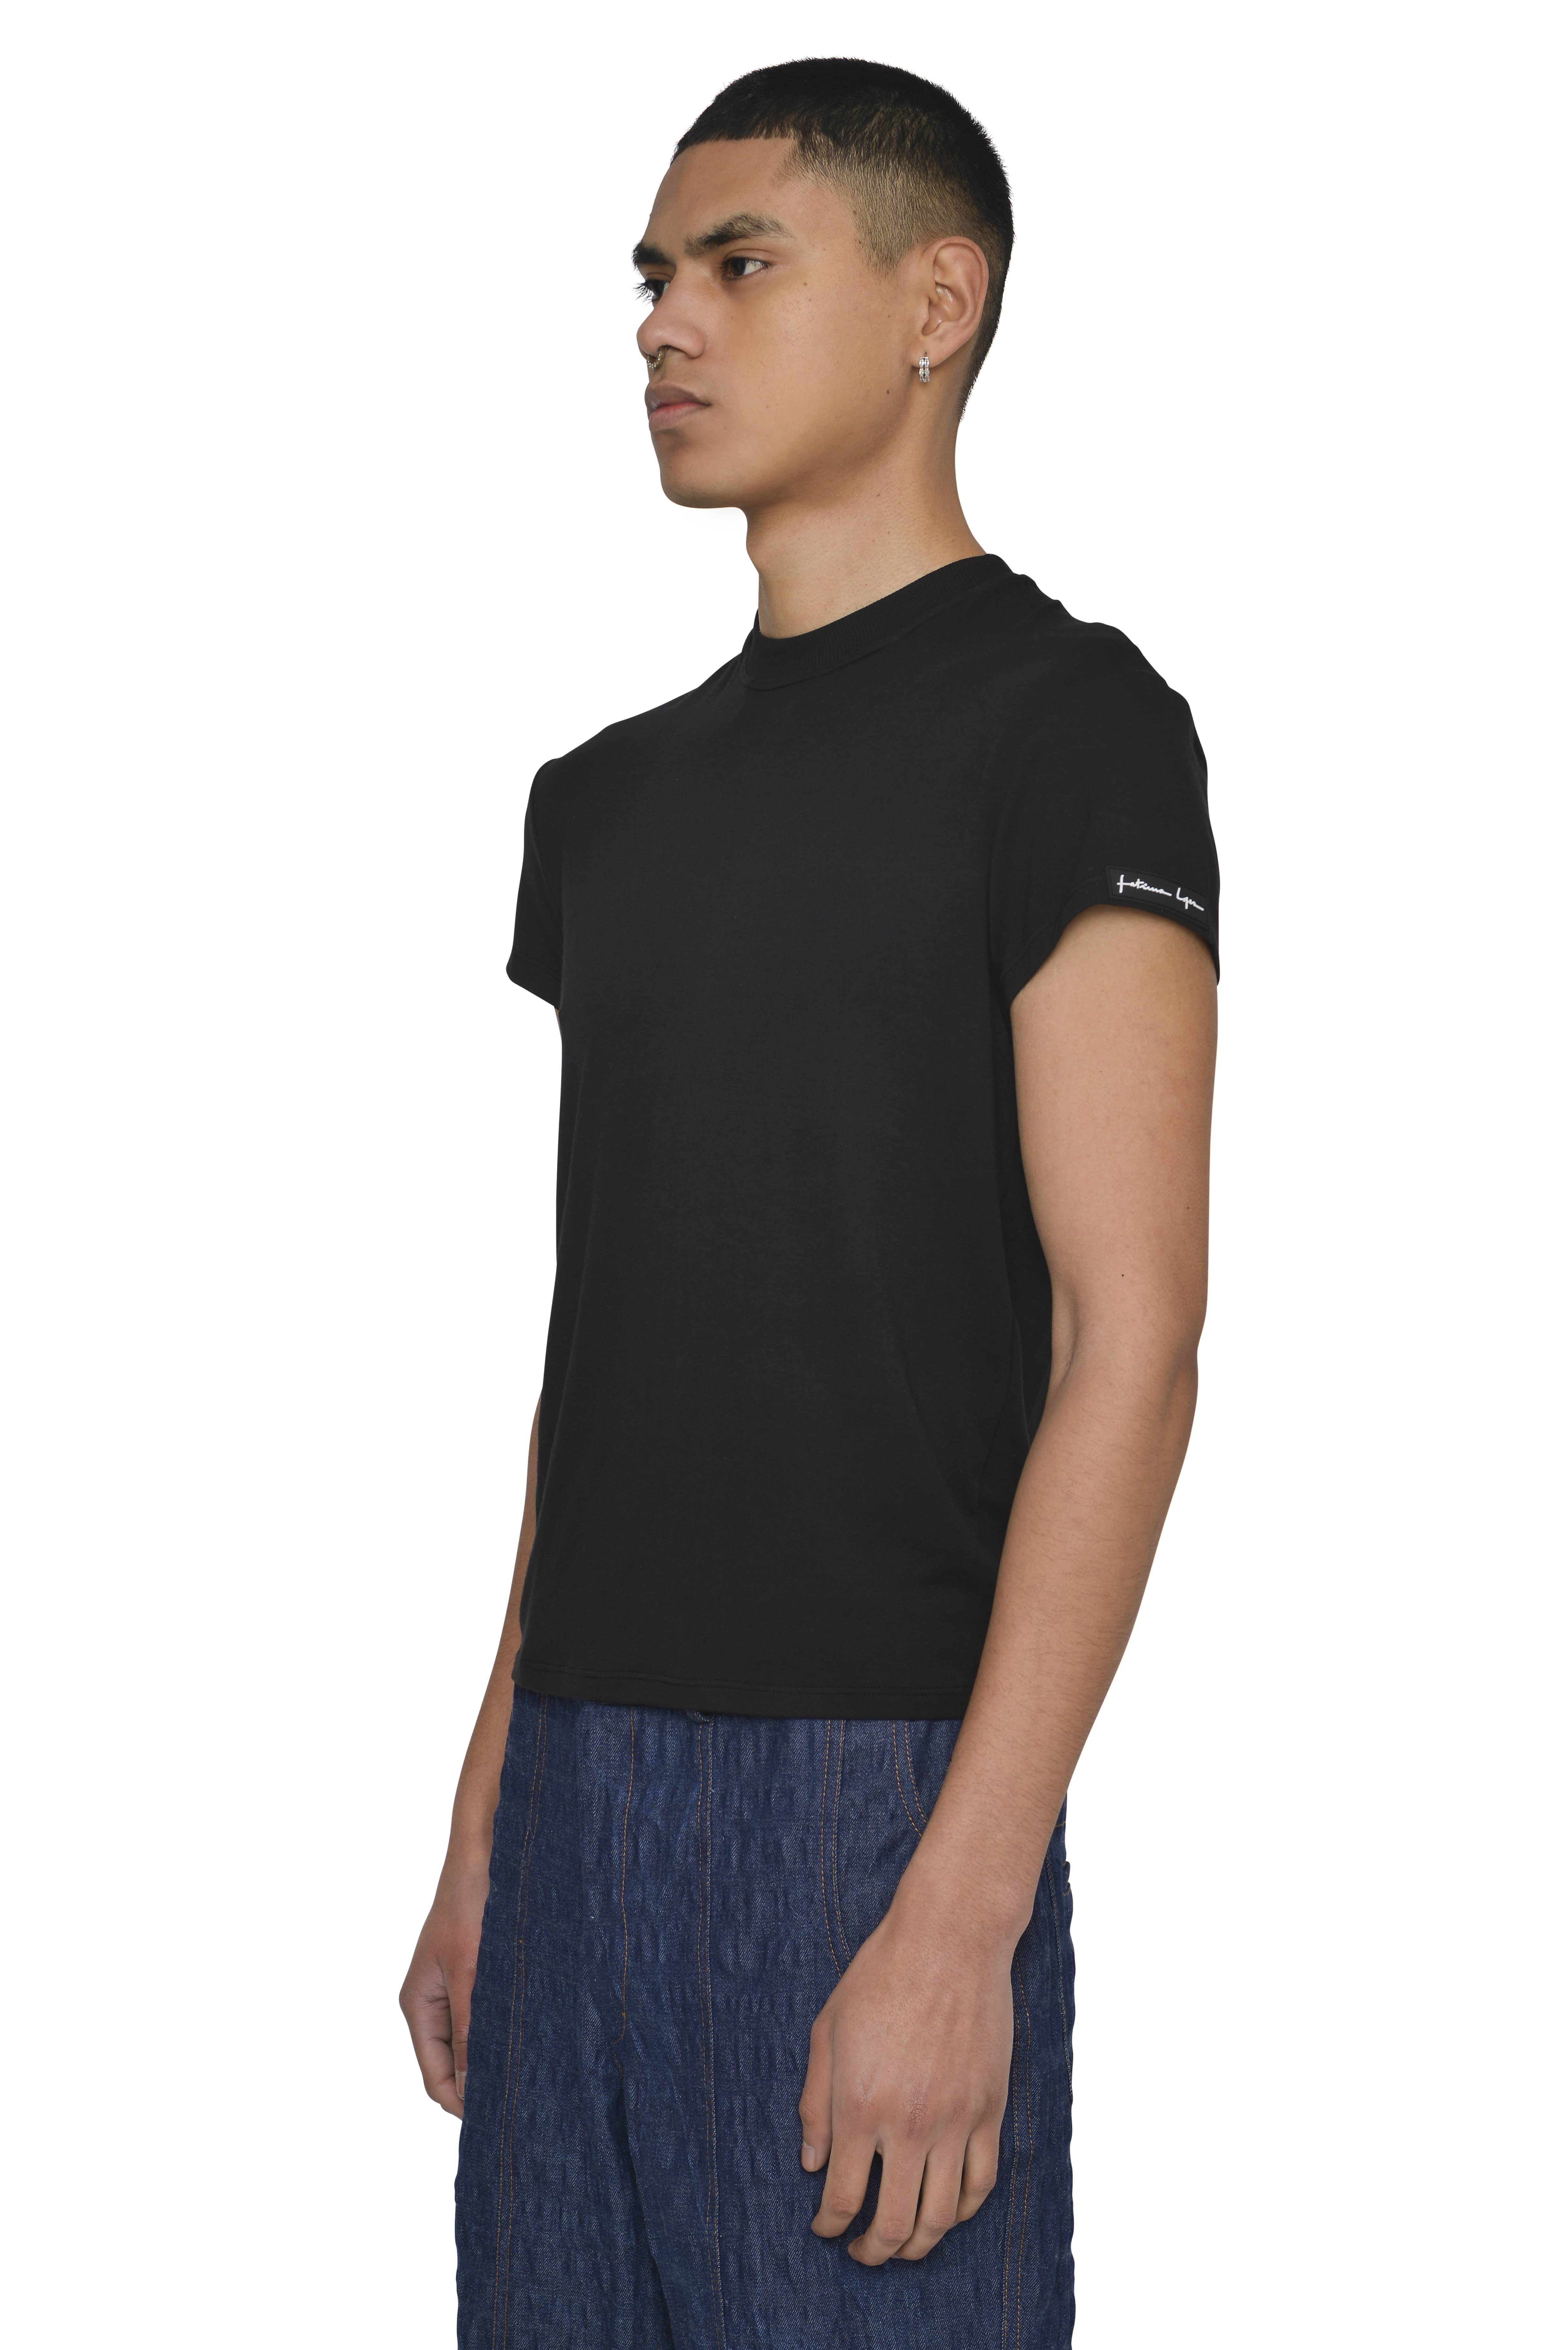 T-Shirt ÁGUIA 3